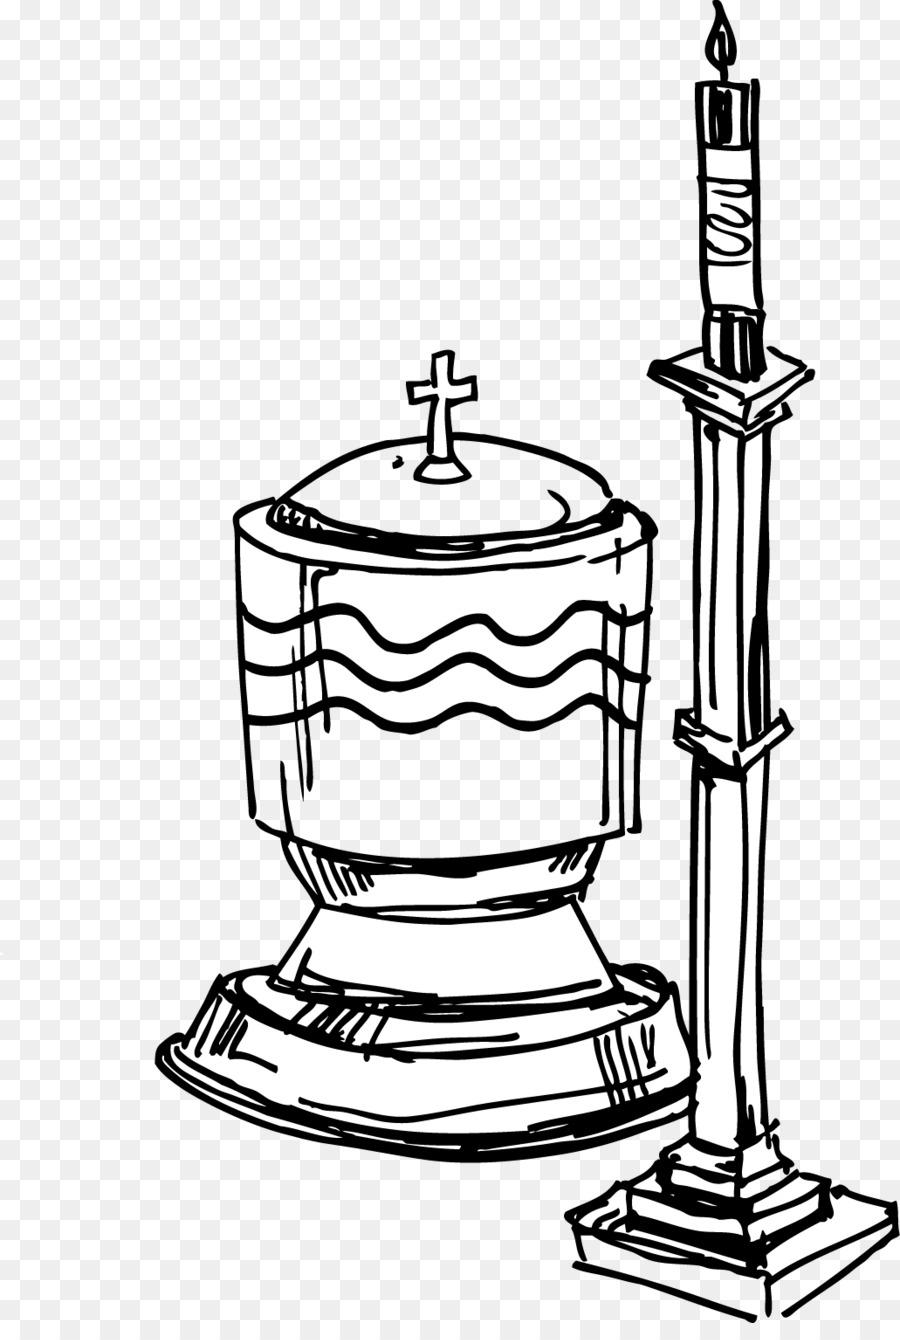 Baptism clipart baptismal font. The sacrament of temple